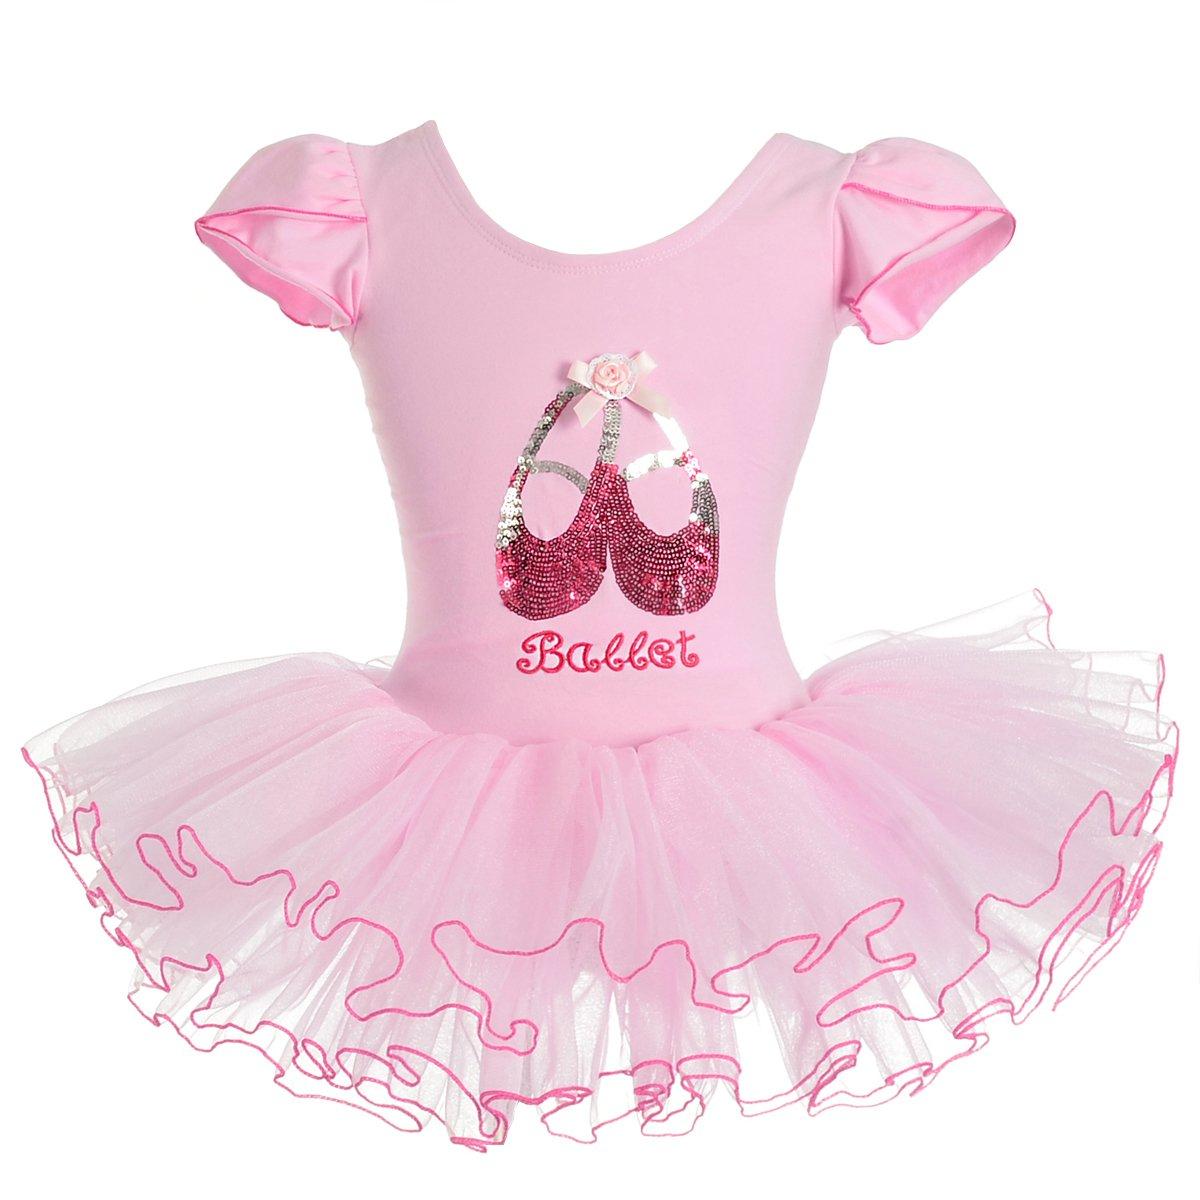 Dressy Daisy Girls 'キラキラバレリーナシューズバレエチュチュフェアリーダンスコスチューム B0144MIBJ6 ピンク 3-4T